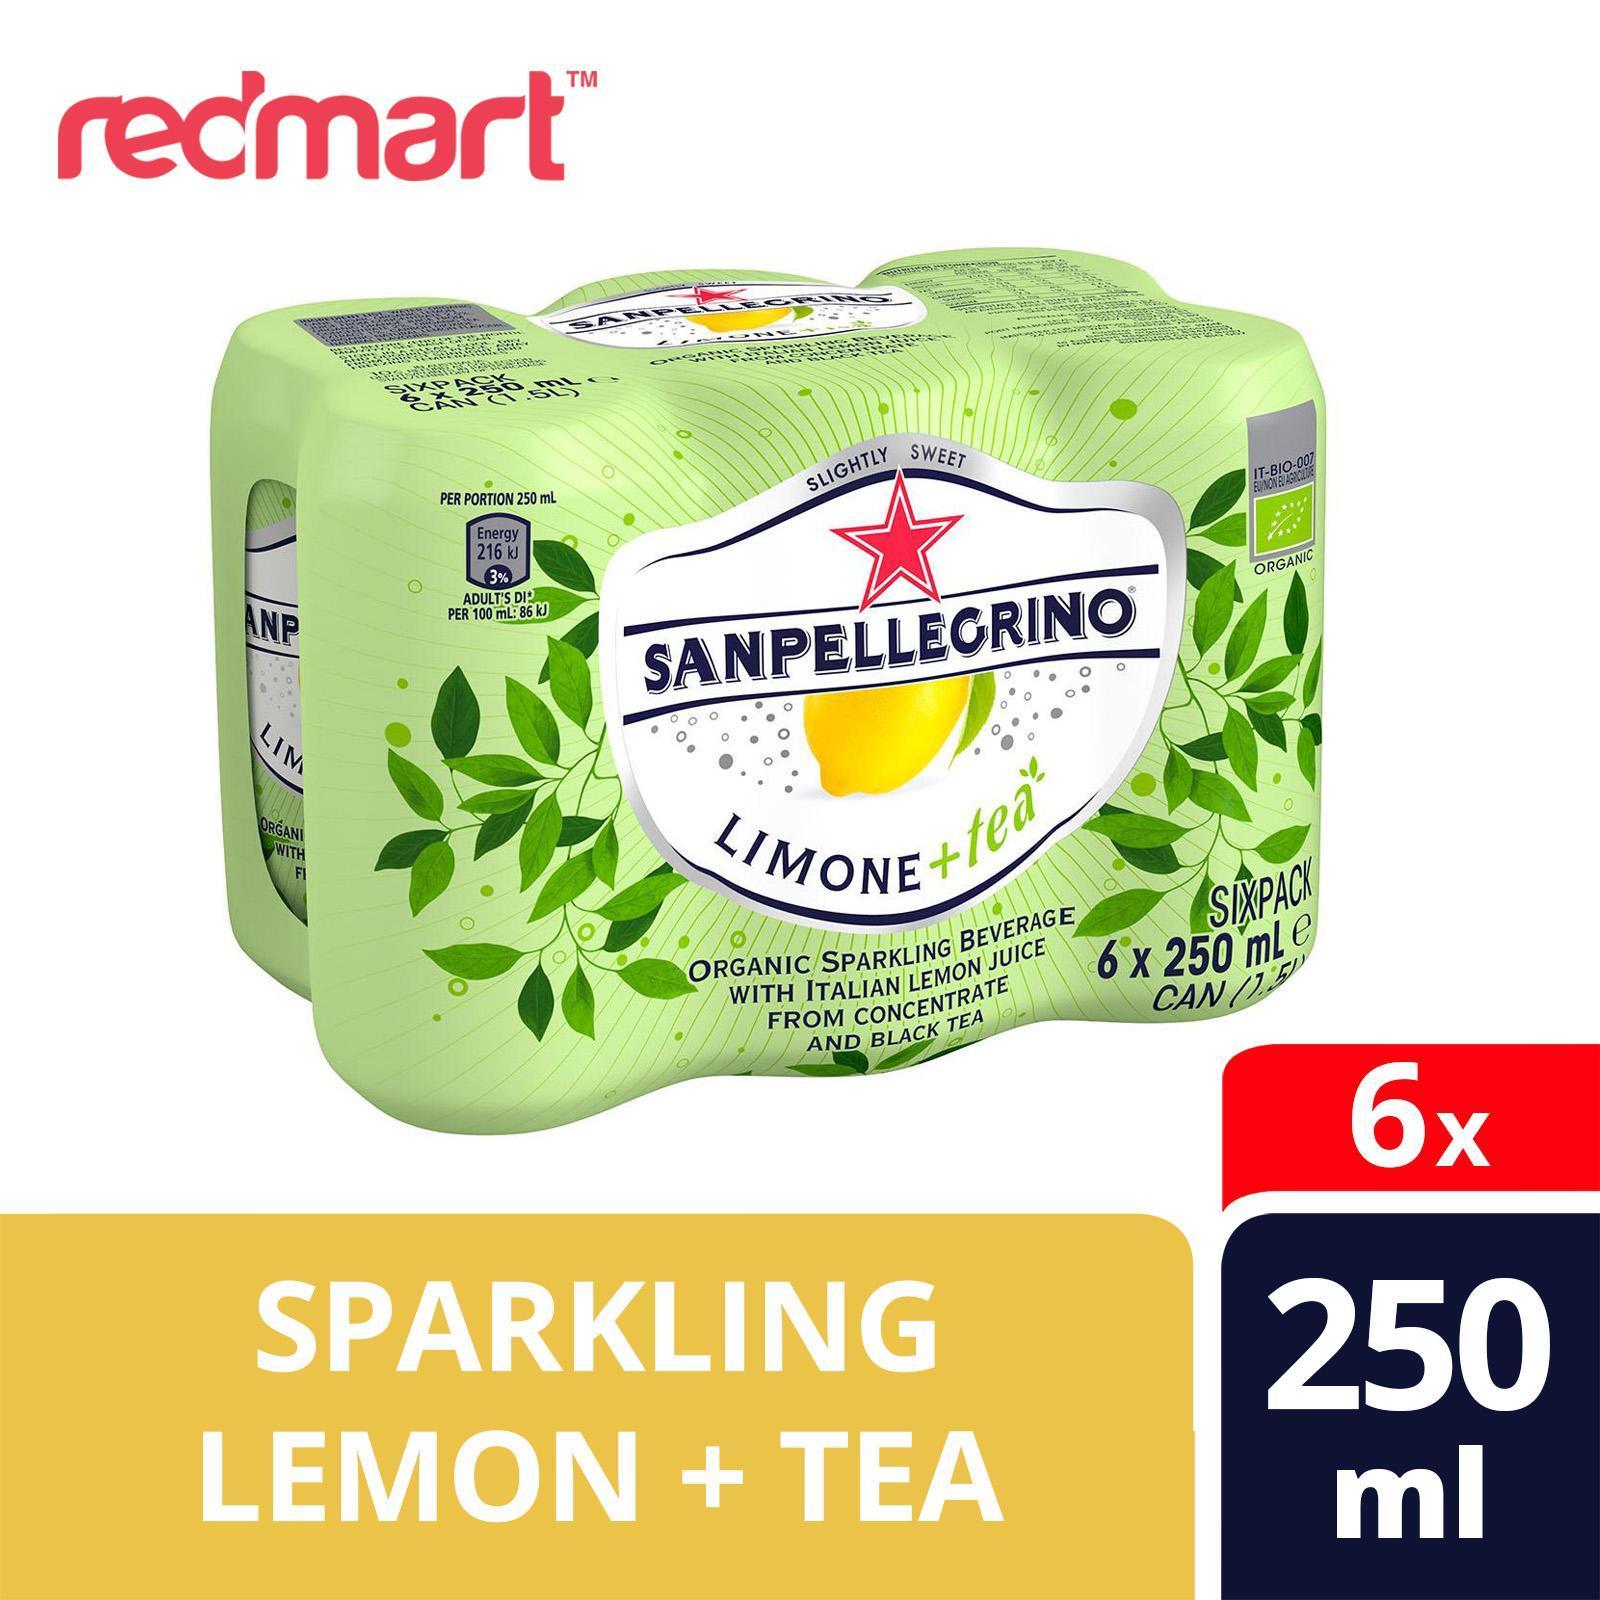 San Pellegrino Limone+Tea Organic Sparkling Lemon Tea Beverage - 6s Pack